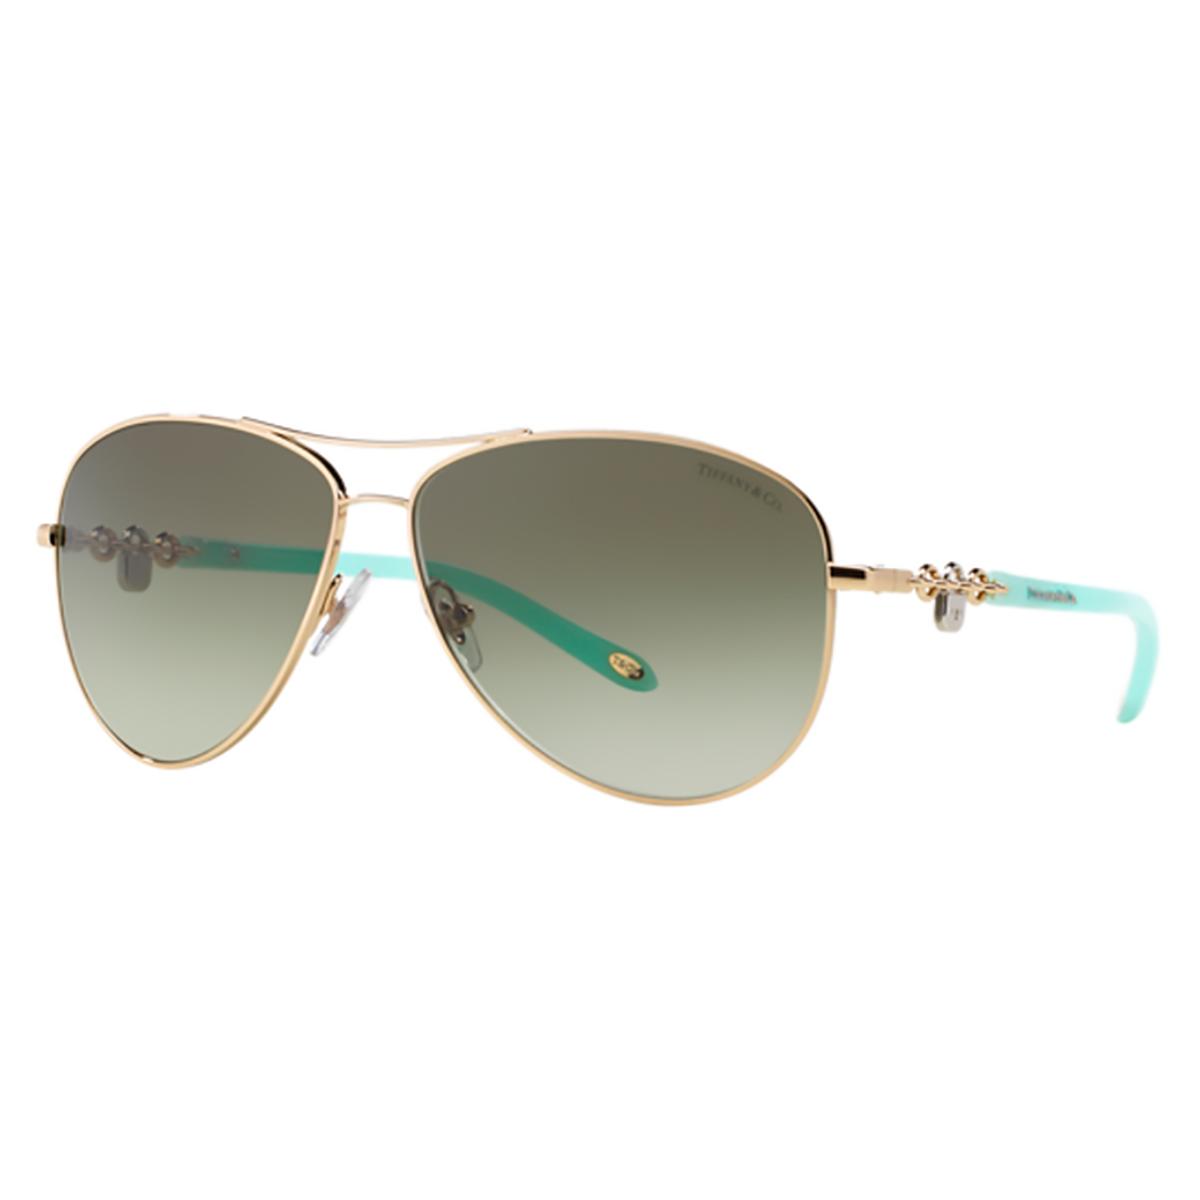 902c739f24ae1 Compre Óculos de Sol Tiffany   Co. em 10X